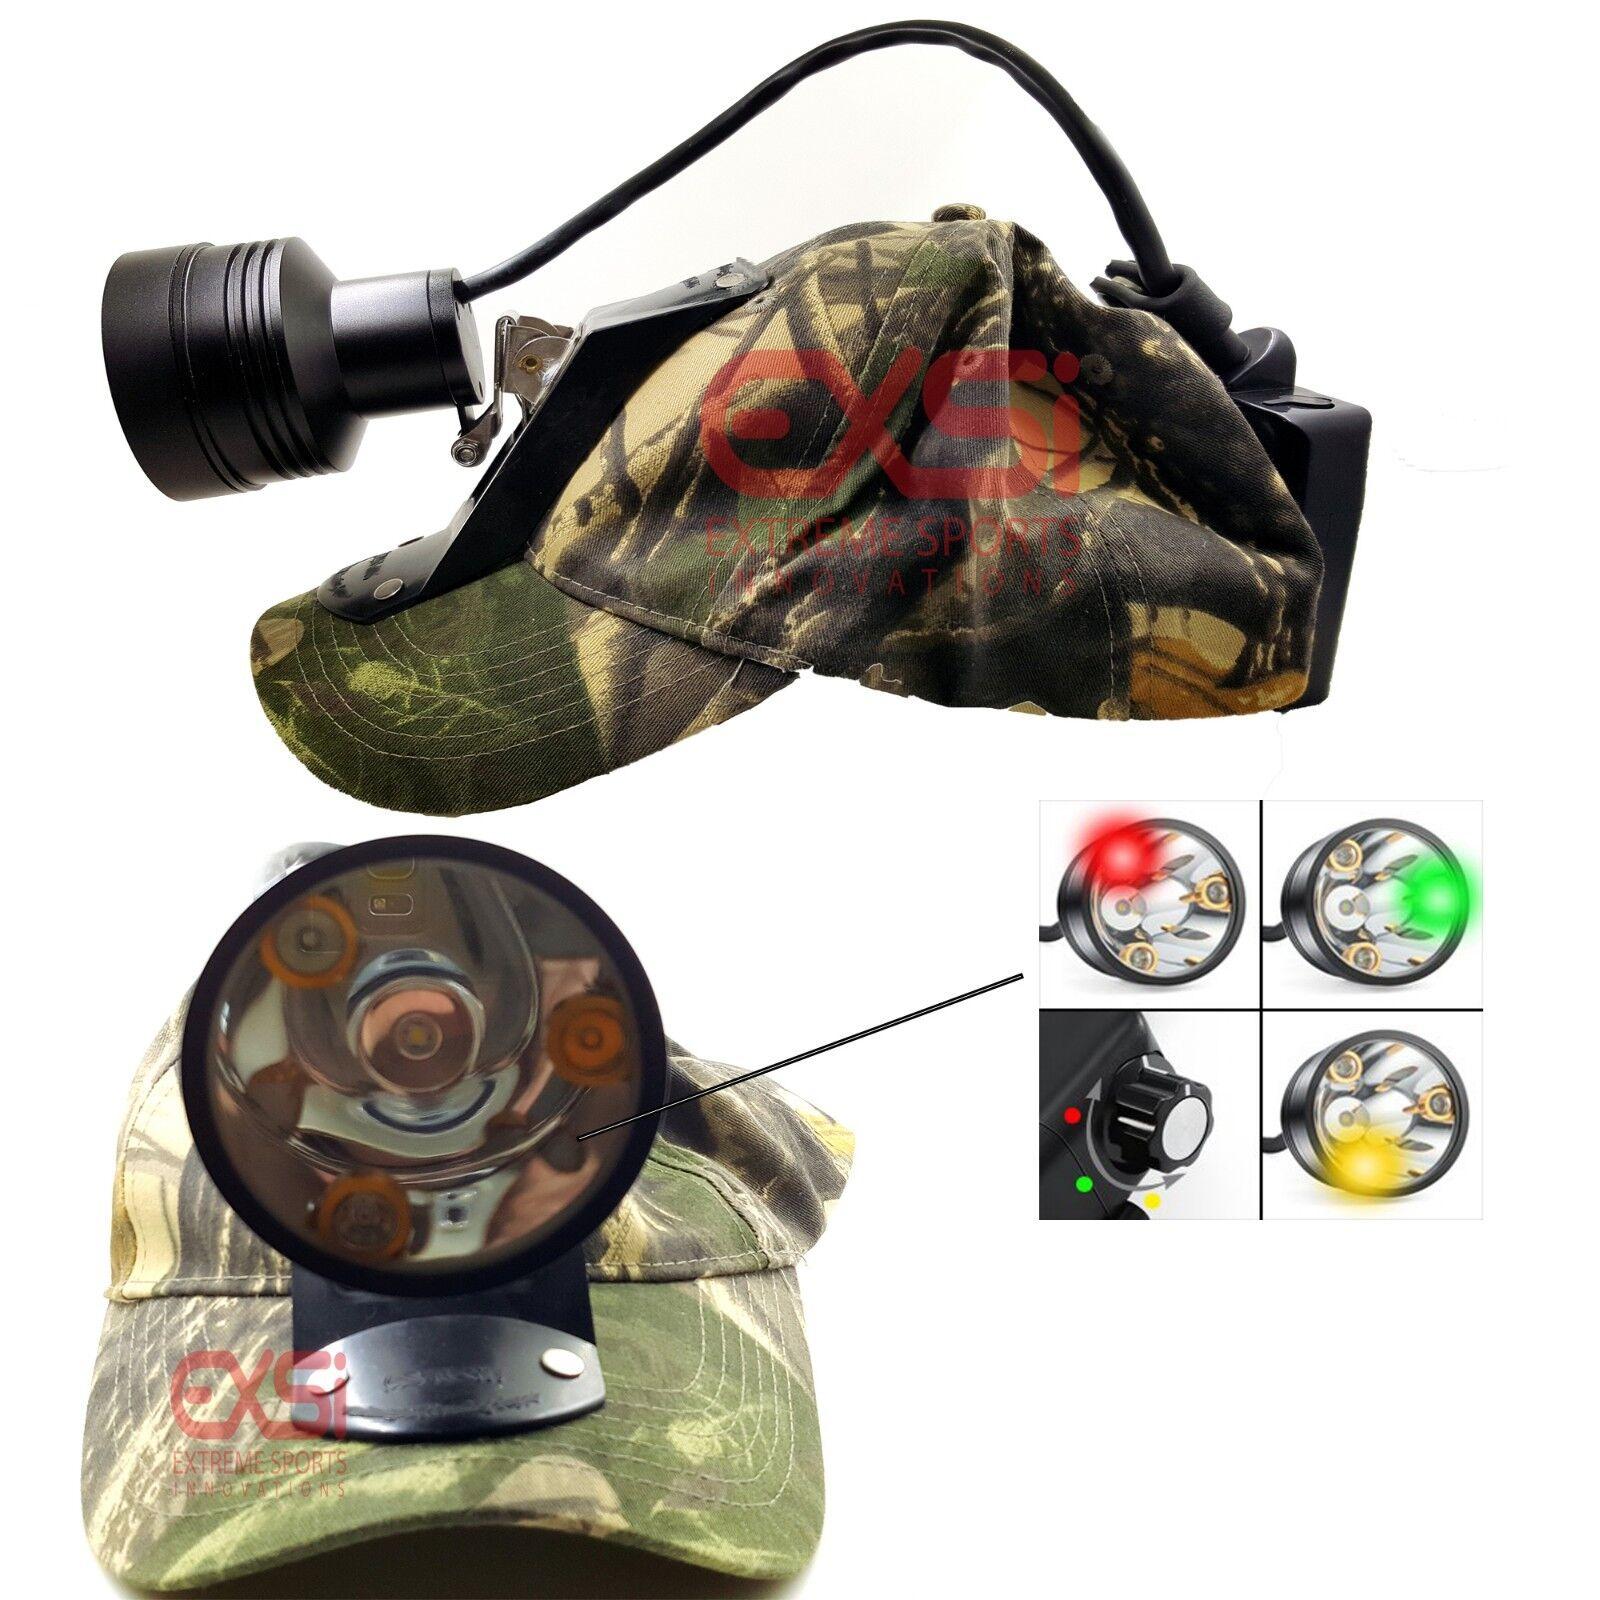 Pro hunter 3C CREE LED Coon Hunting hog Hunting light bump cup light & Free Gift